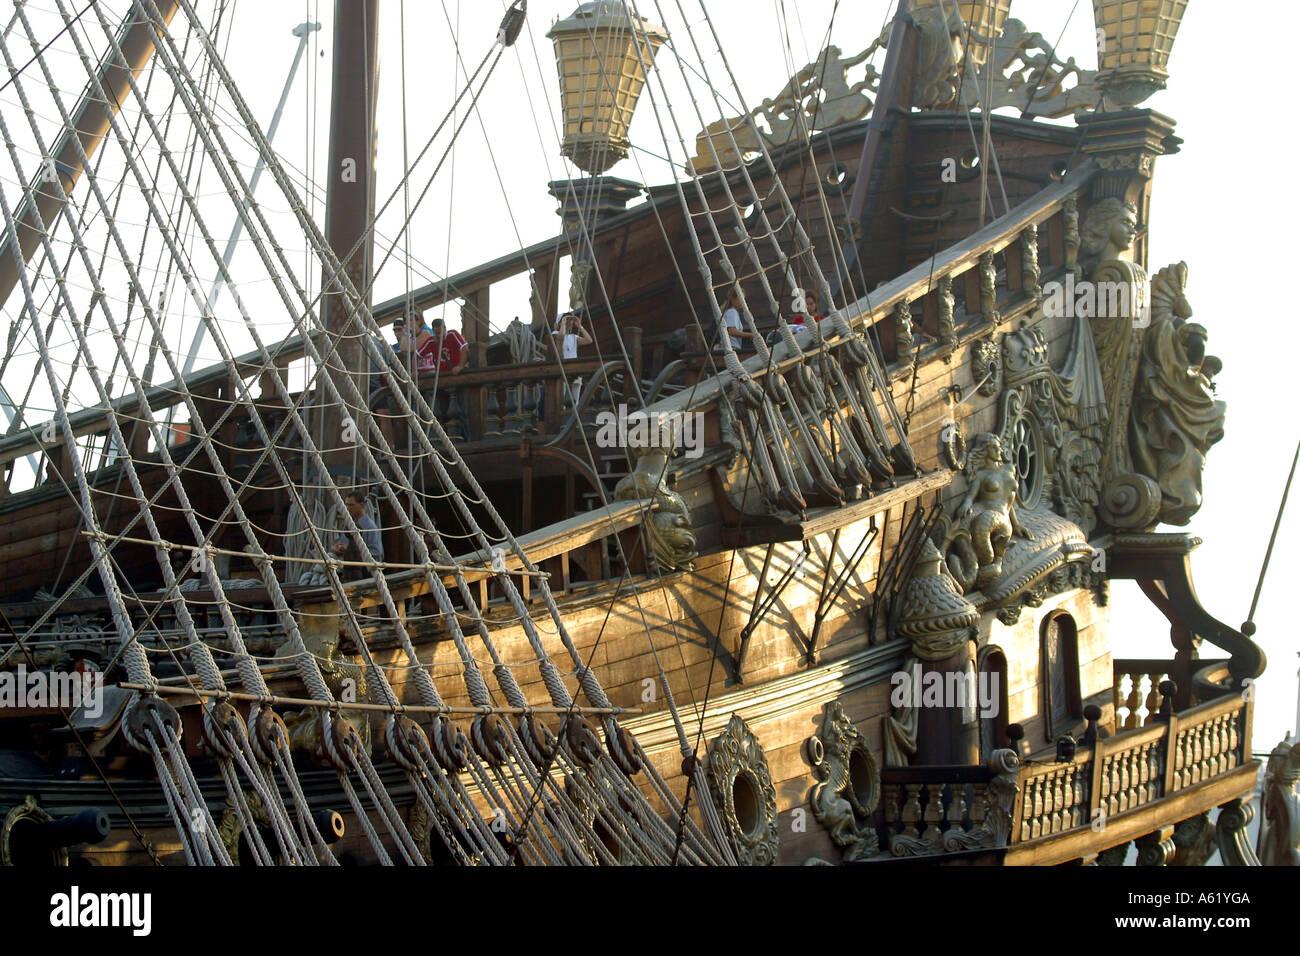 Pirates galleon Genoa Ligury Italy - Stock Image